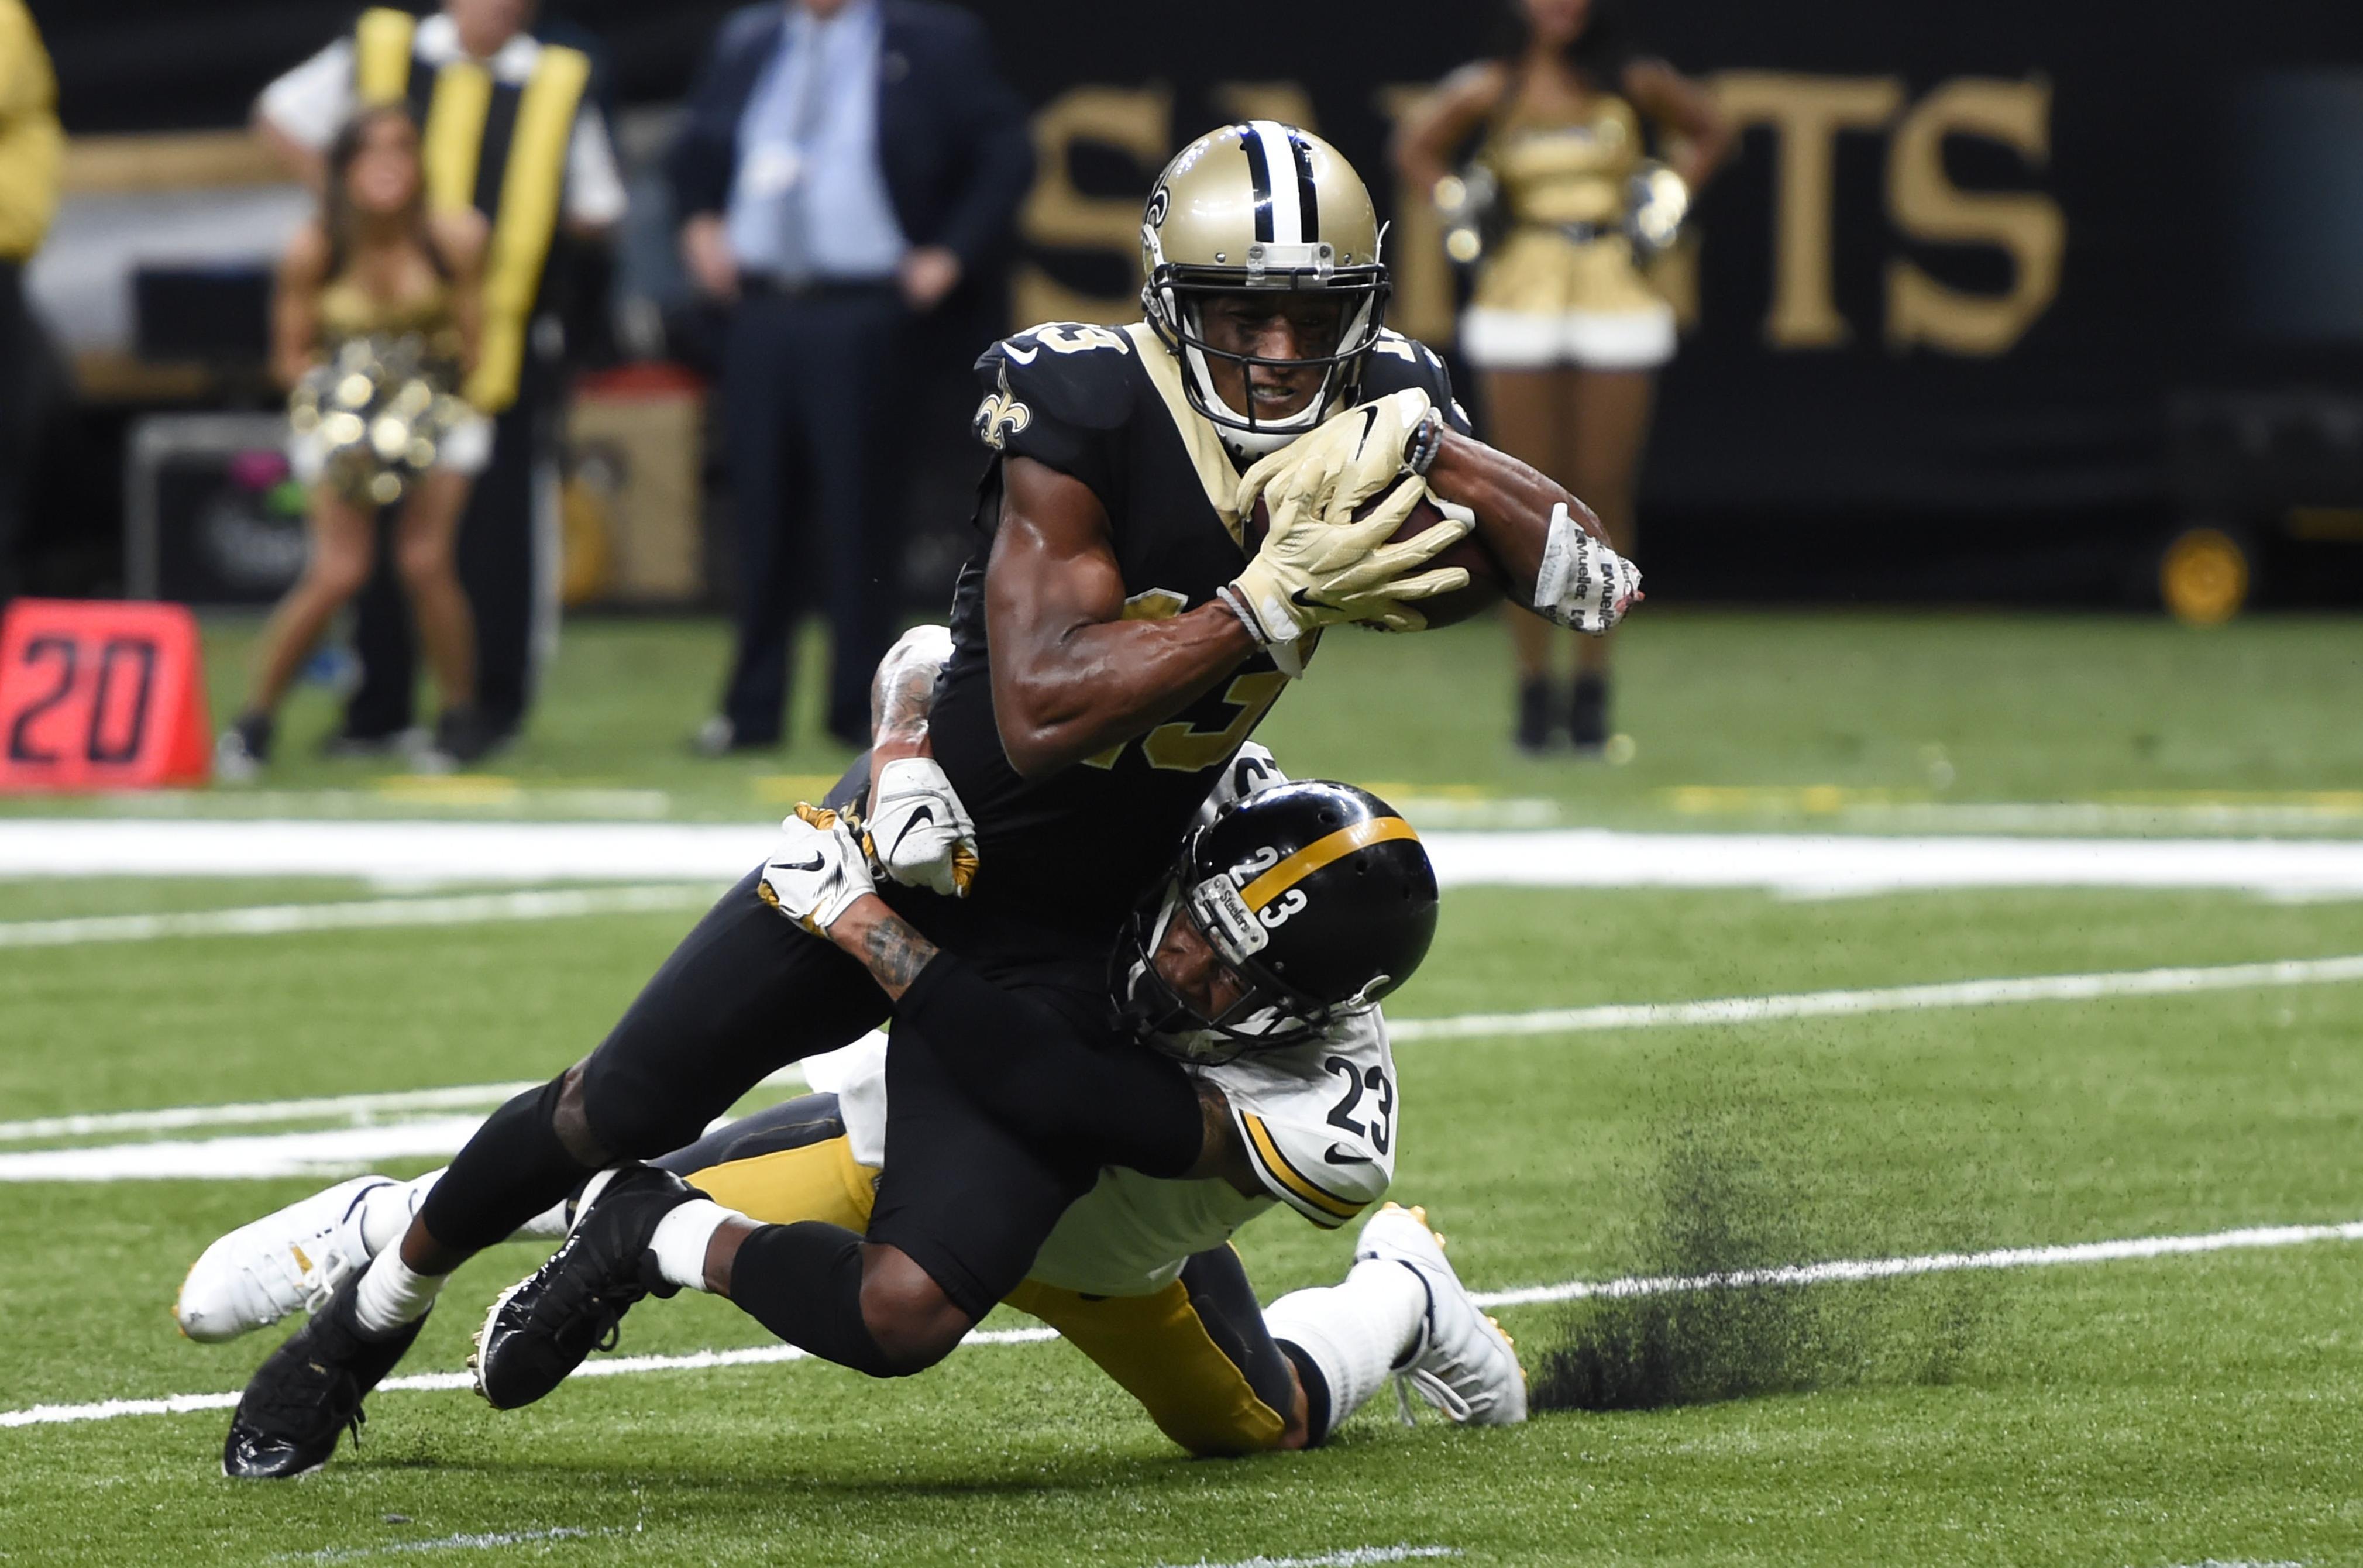 c5d5e7ed683c60 Pittsburgh Steelers cornerback Joe Haden (23) tackles New Orleans Saints  wide receiver Michael Thomas